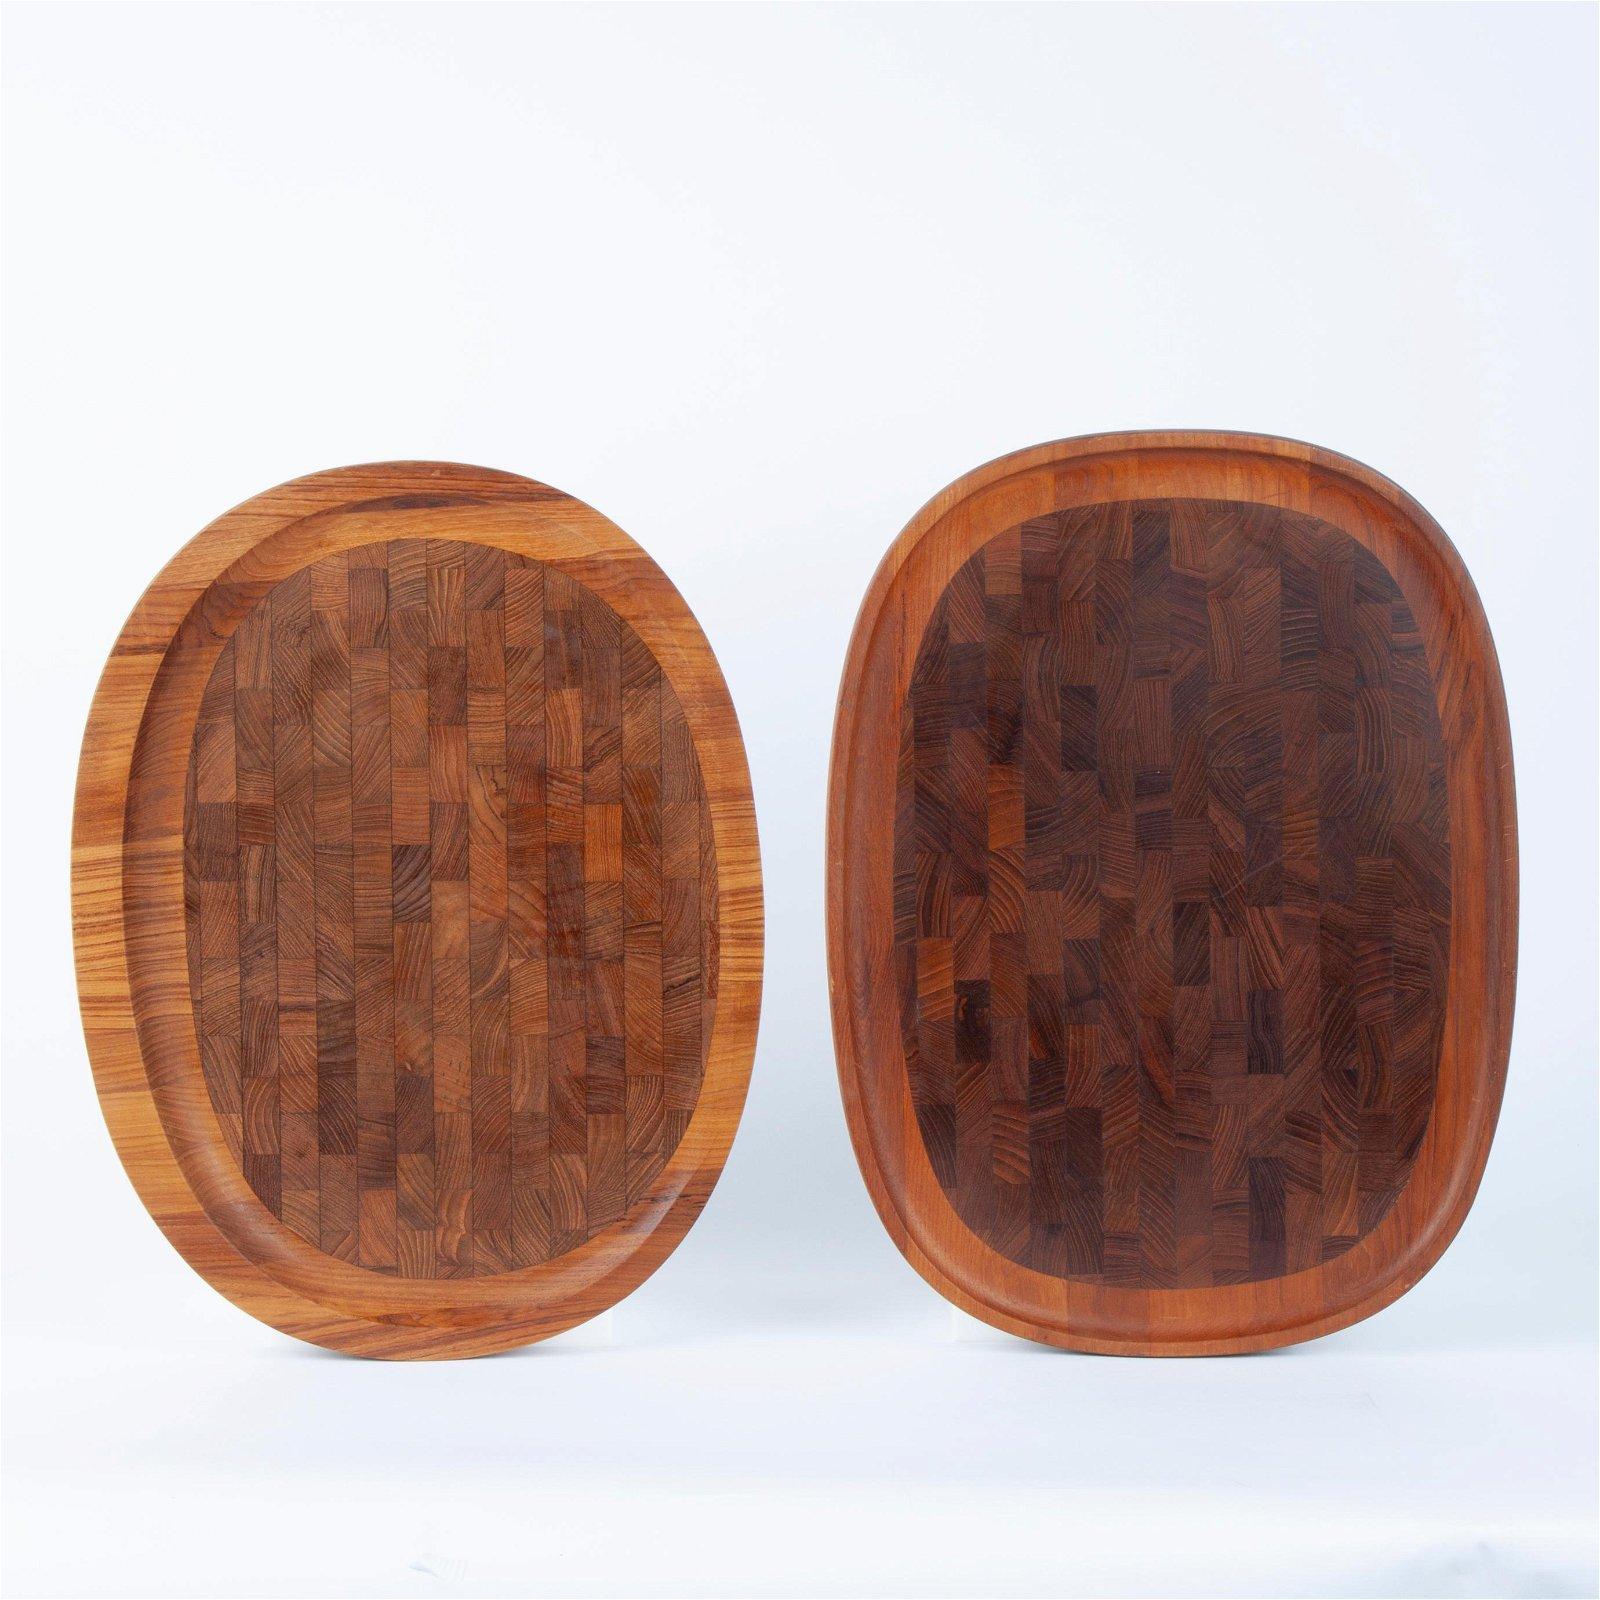 Jens Quistgaard for Dansk: Two Platters